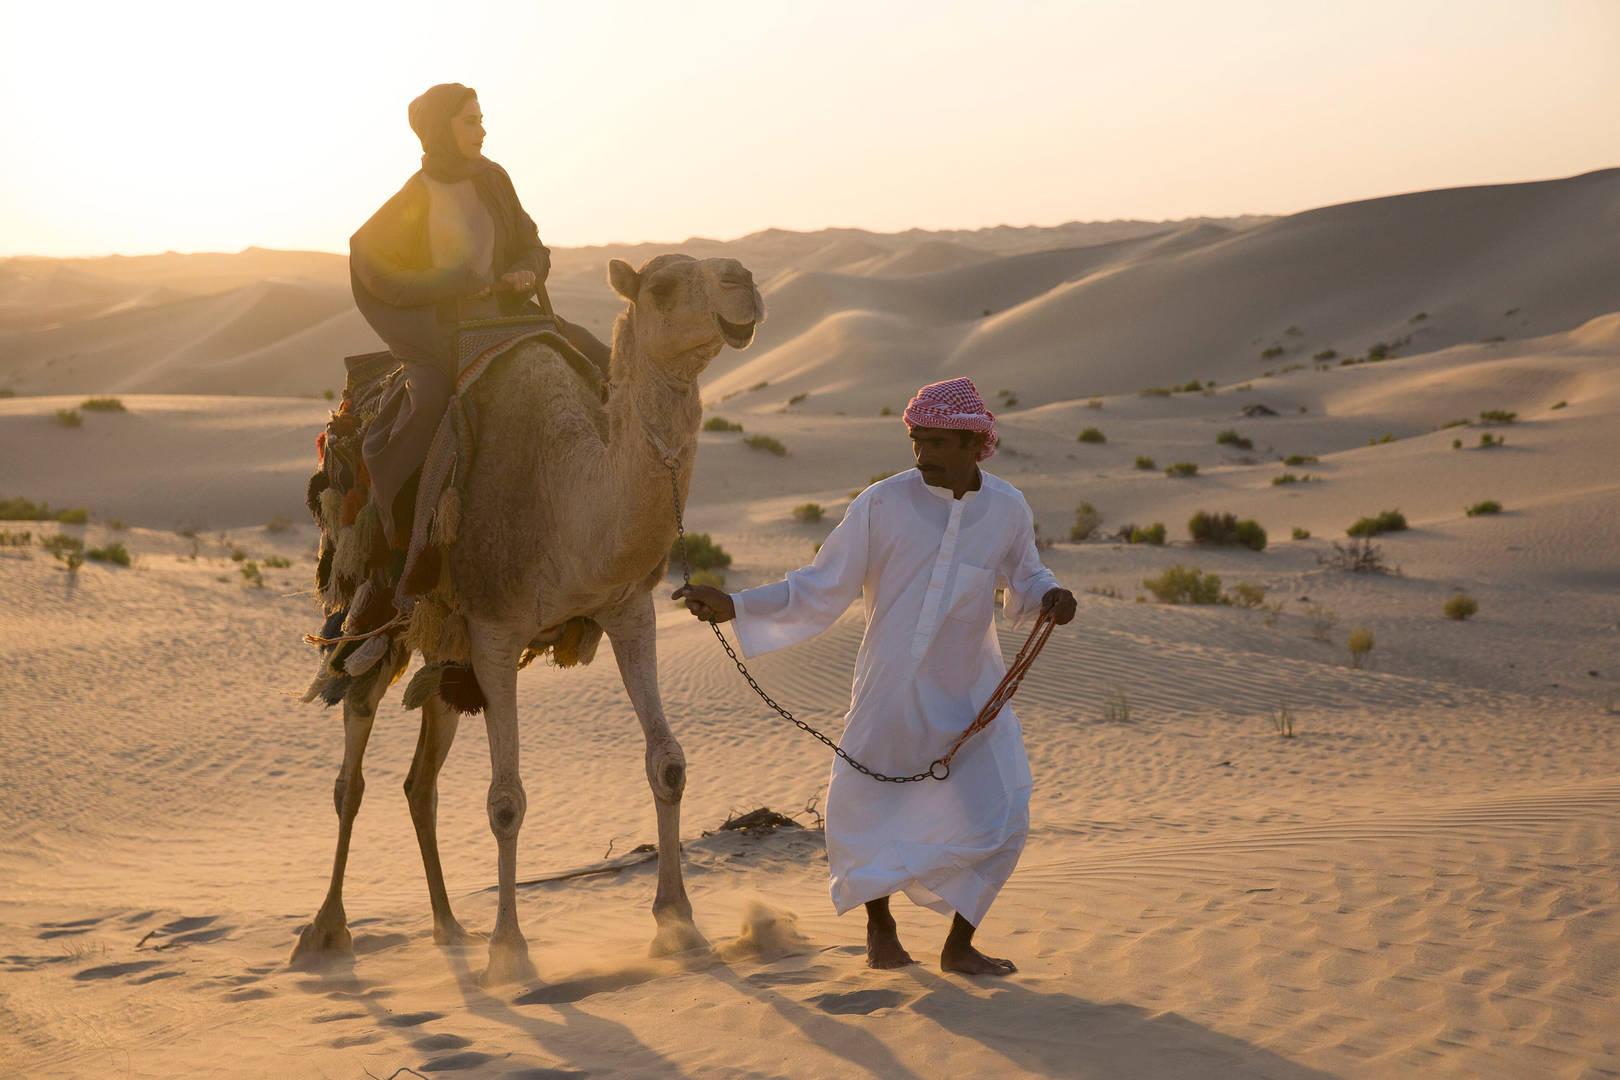 Woman on a camel